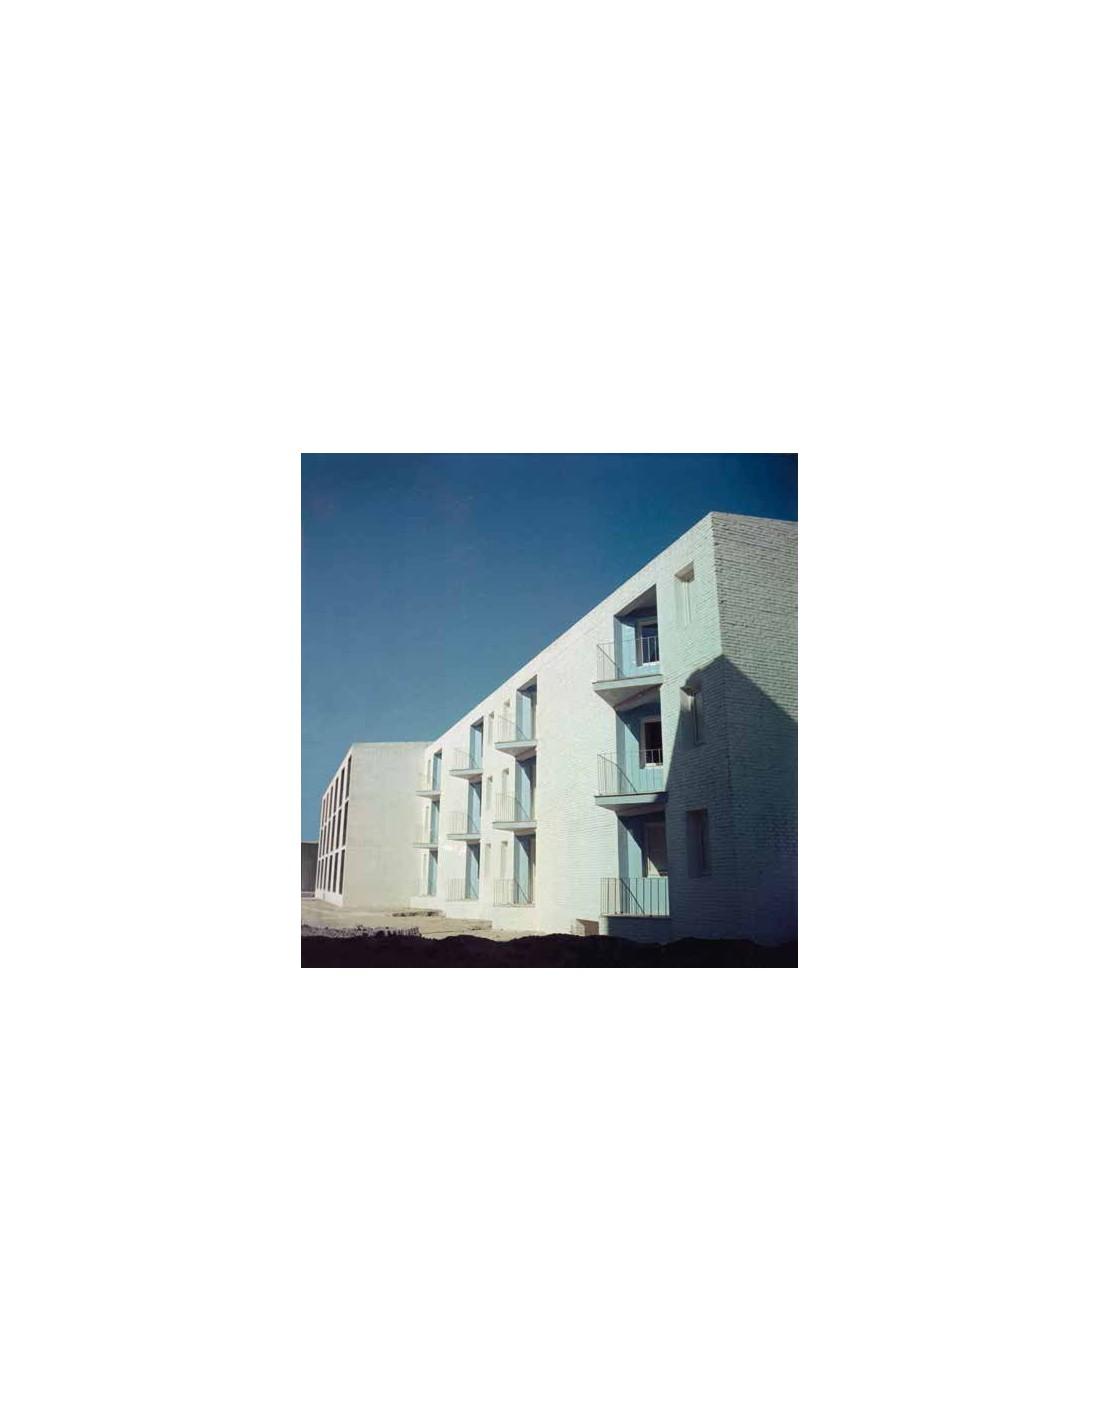 Comprar libro fotograf a y arquitectura moderna en espa a for Libro medidas arquitectura